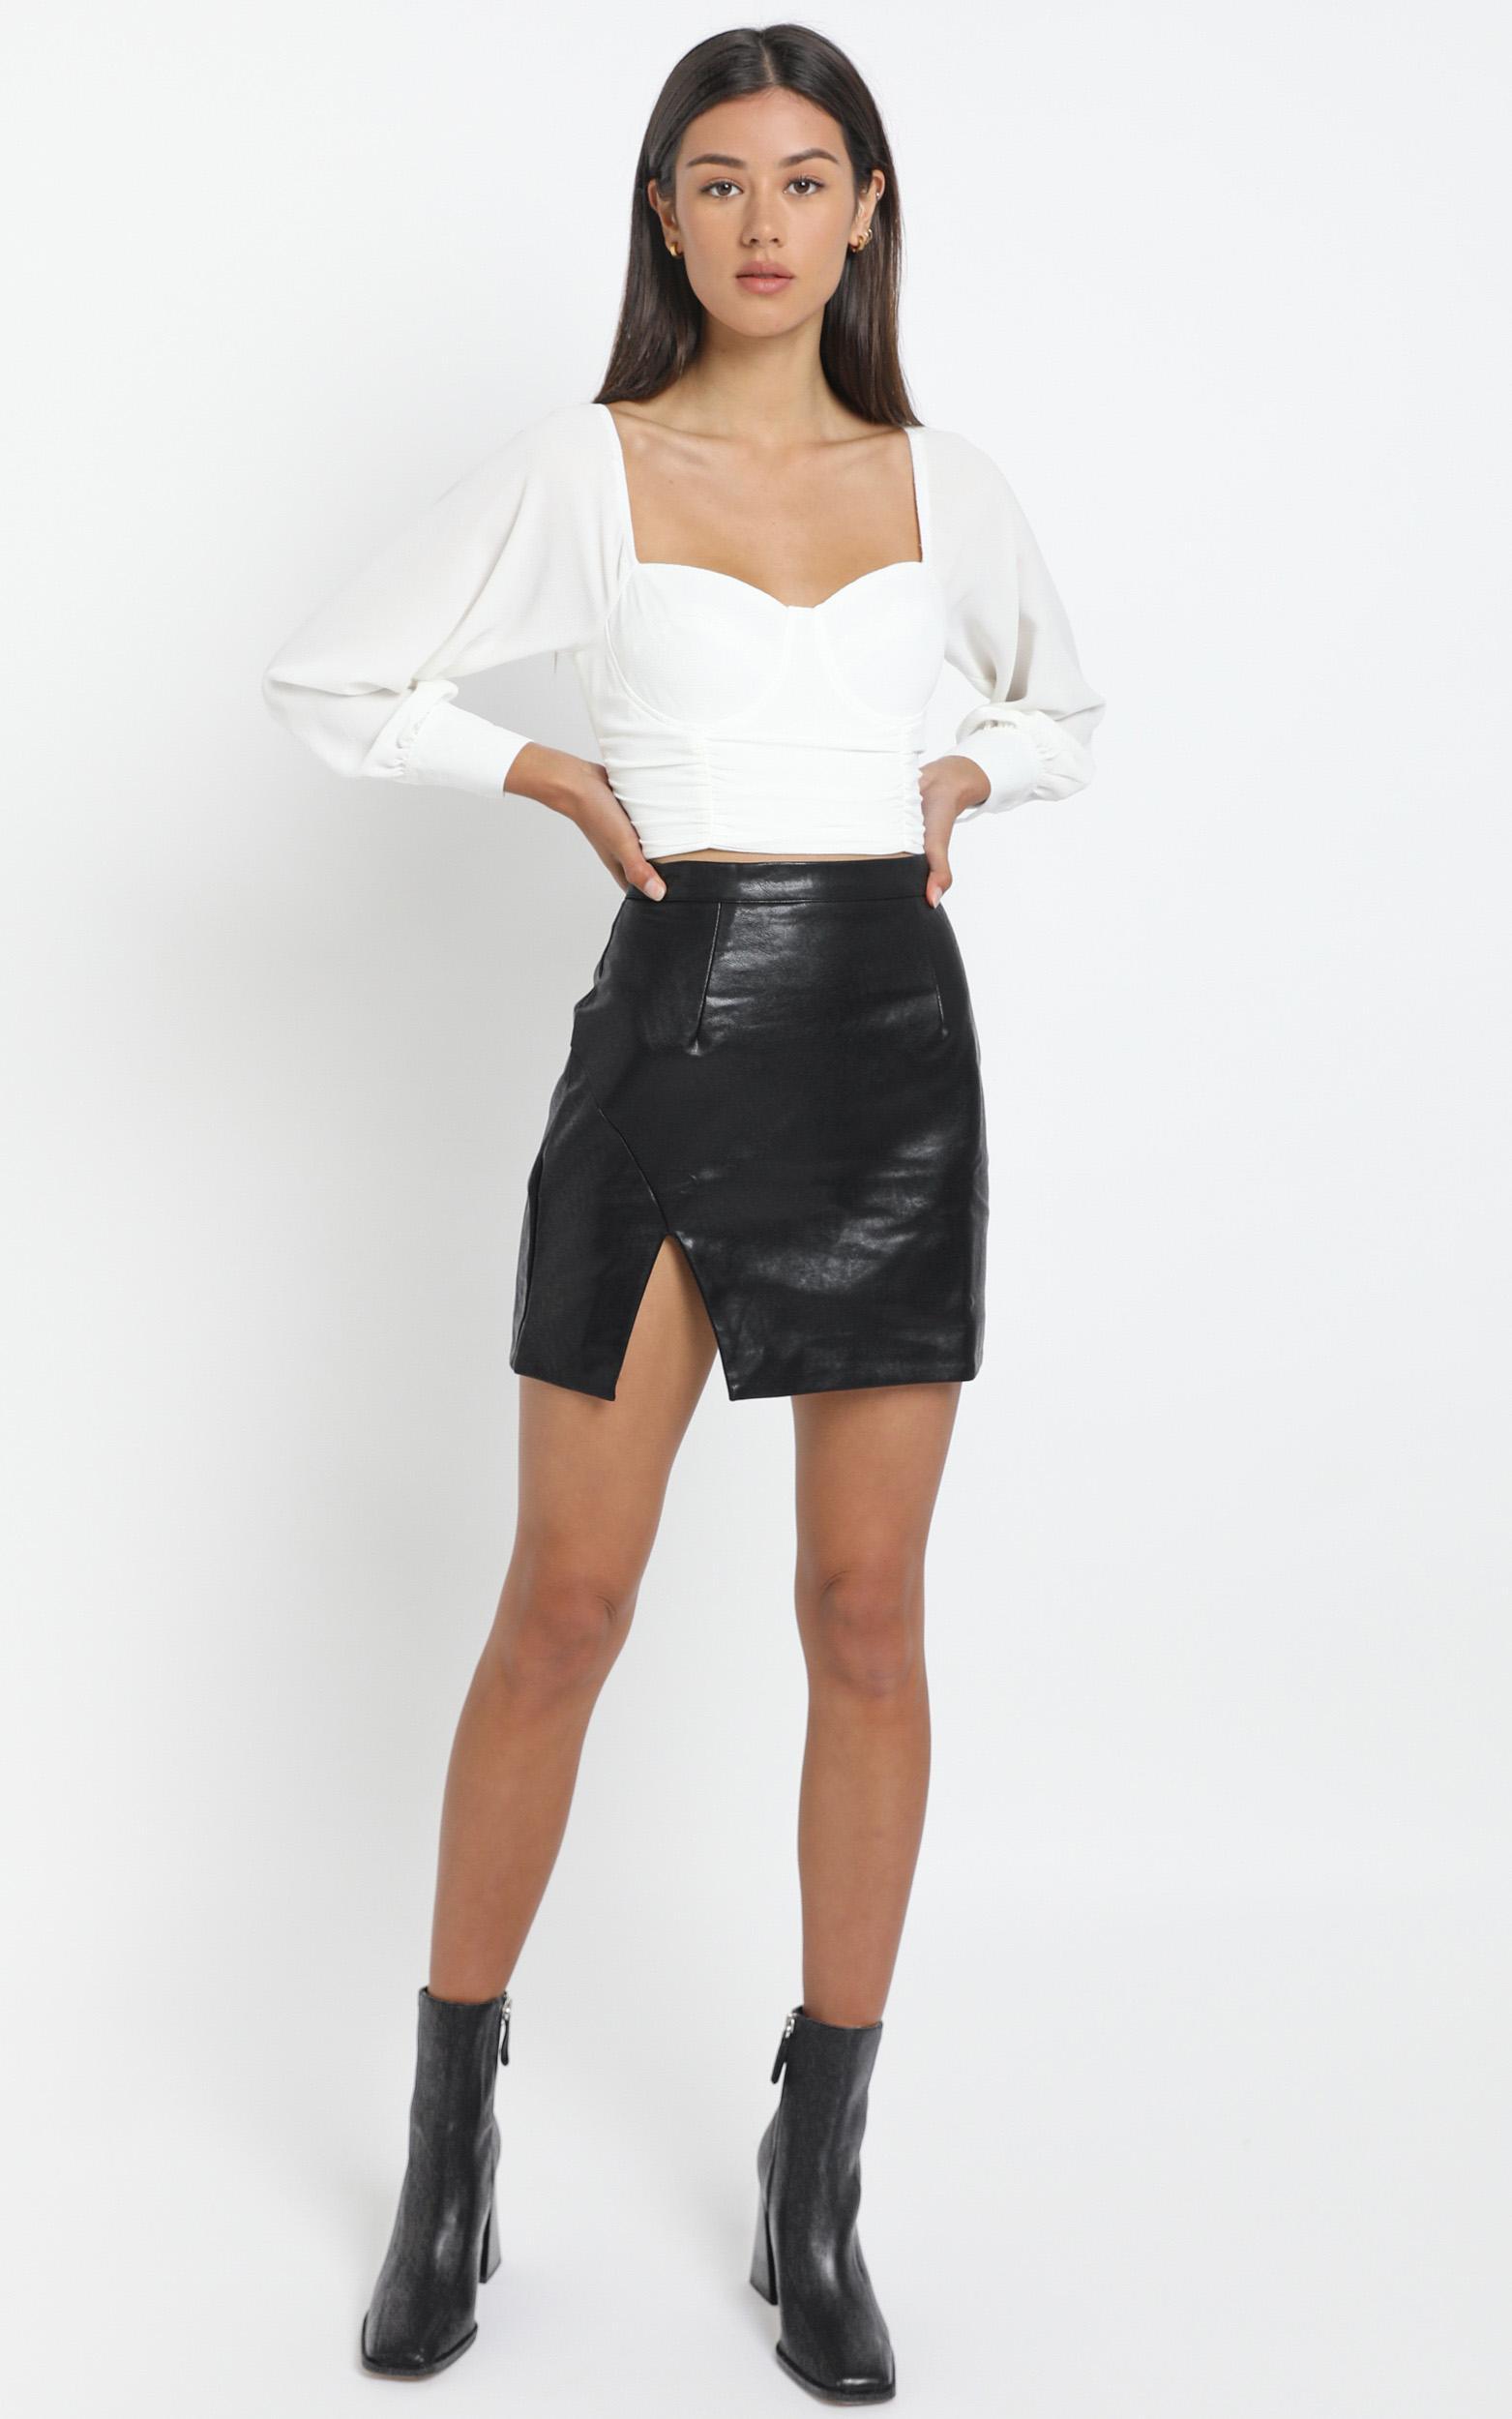 Persia Skirt in Black - 12 (L), Black, hi-res image number null